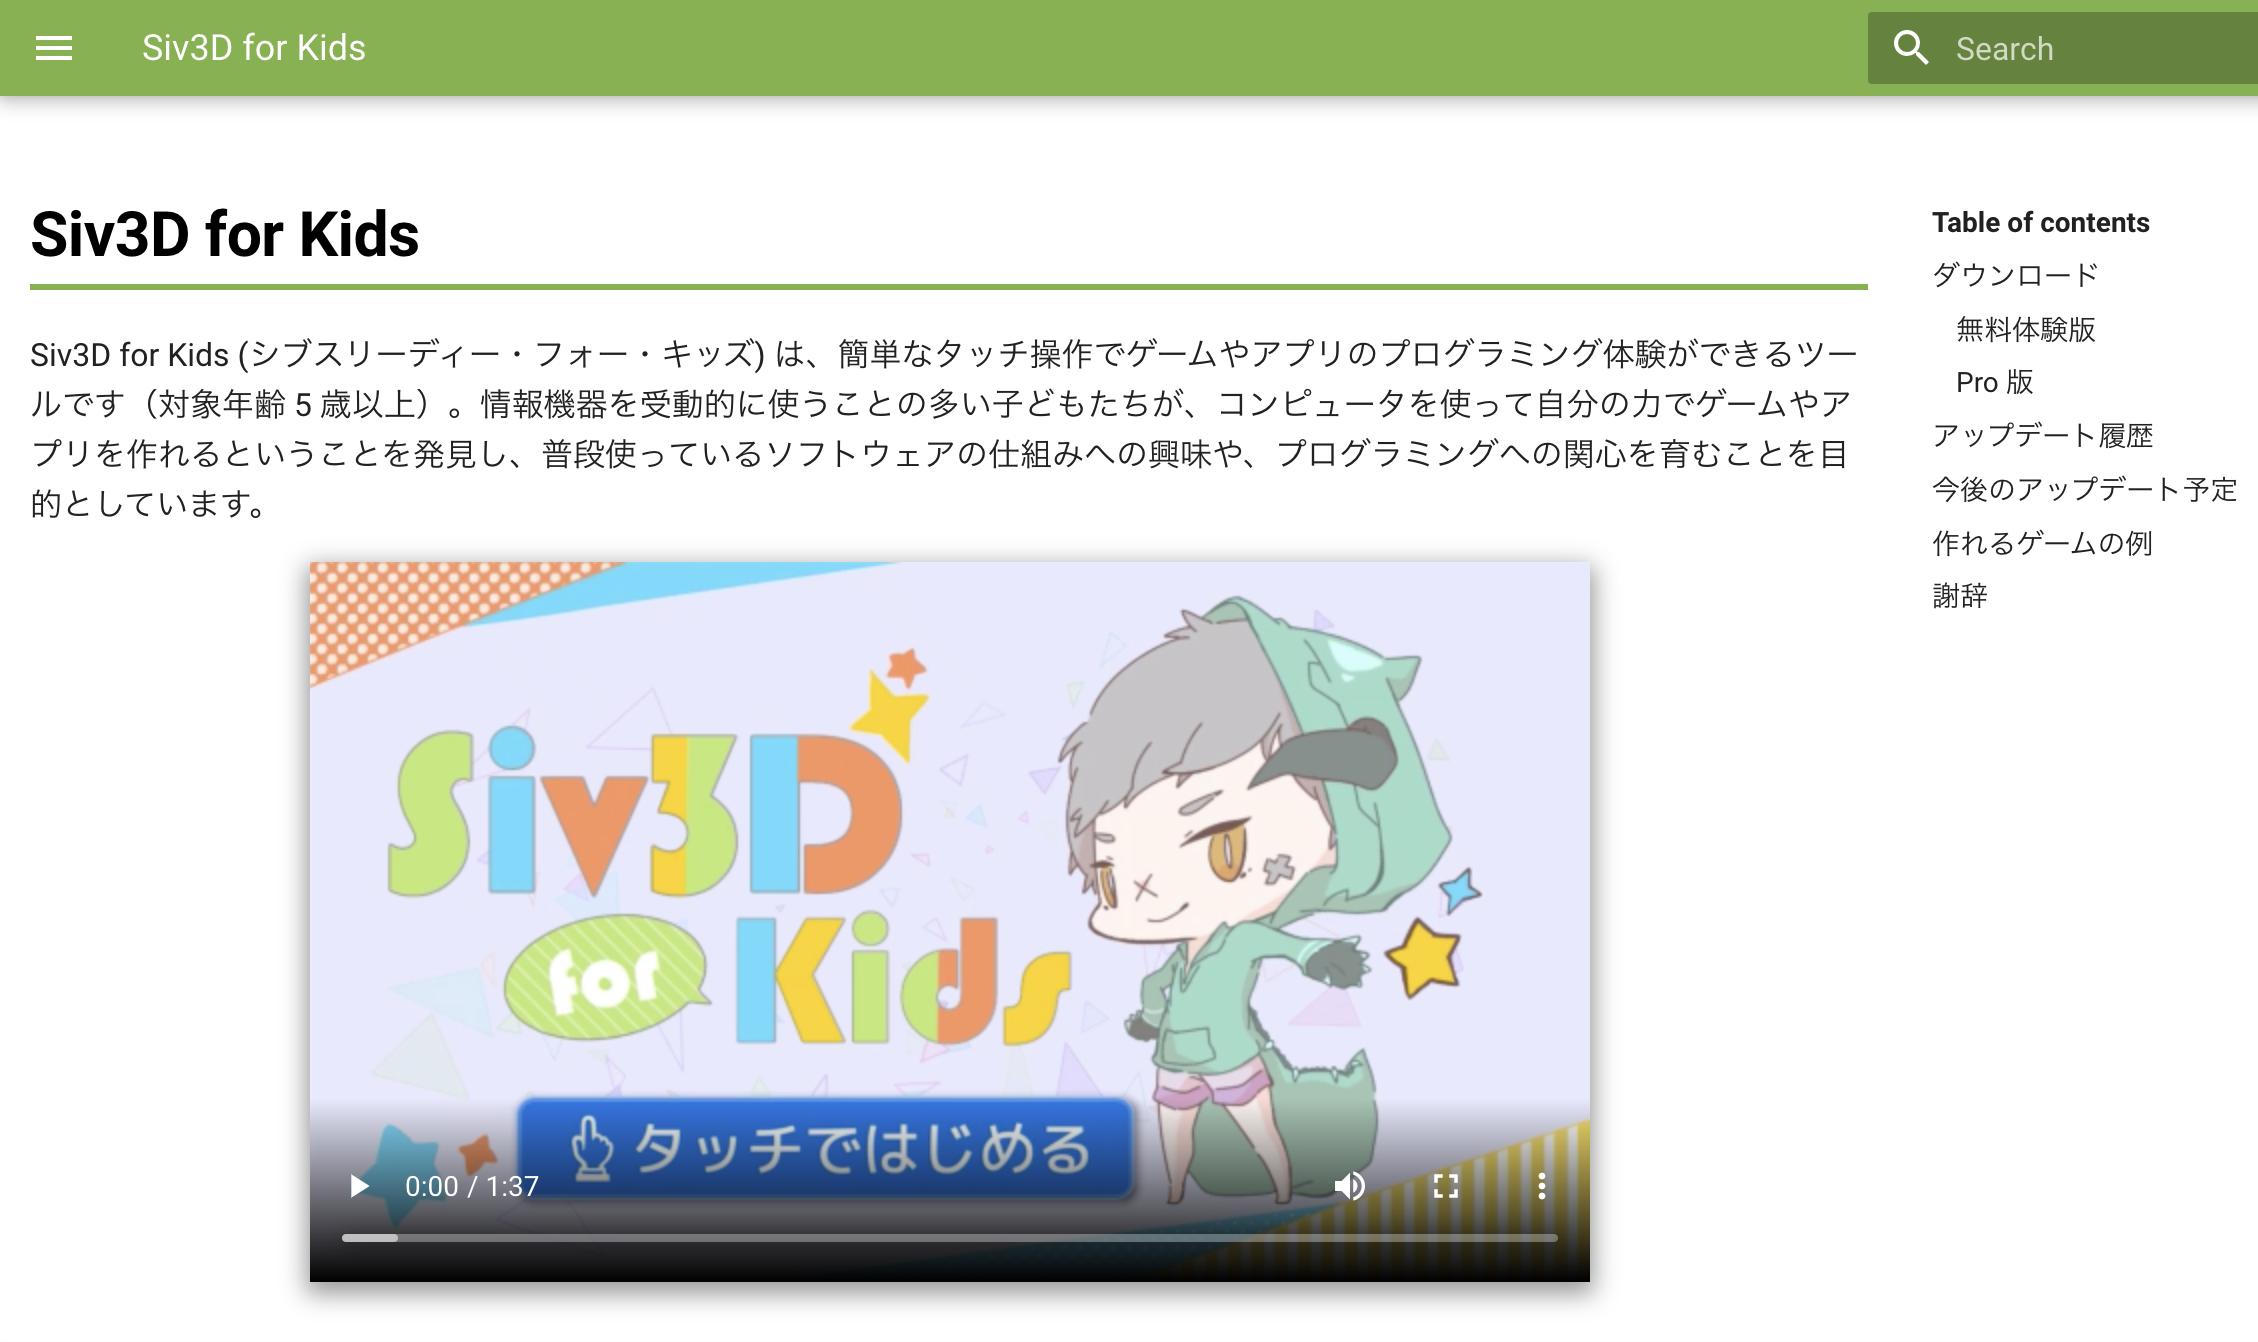 Siv3Dイメージ画像